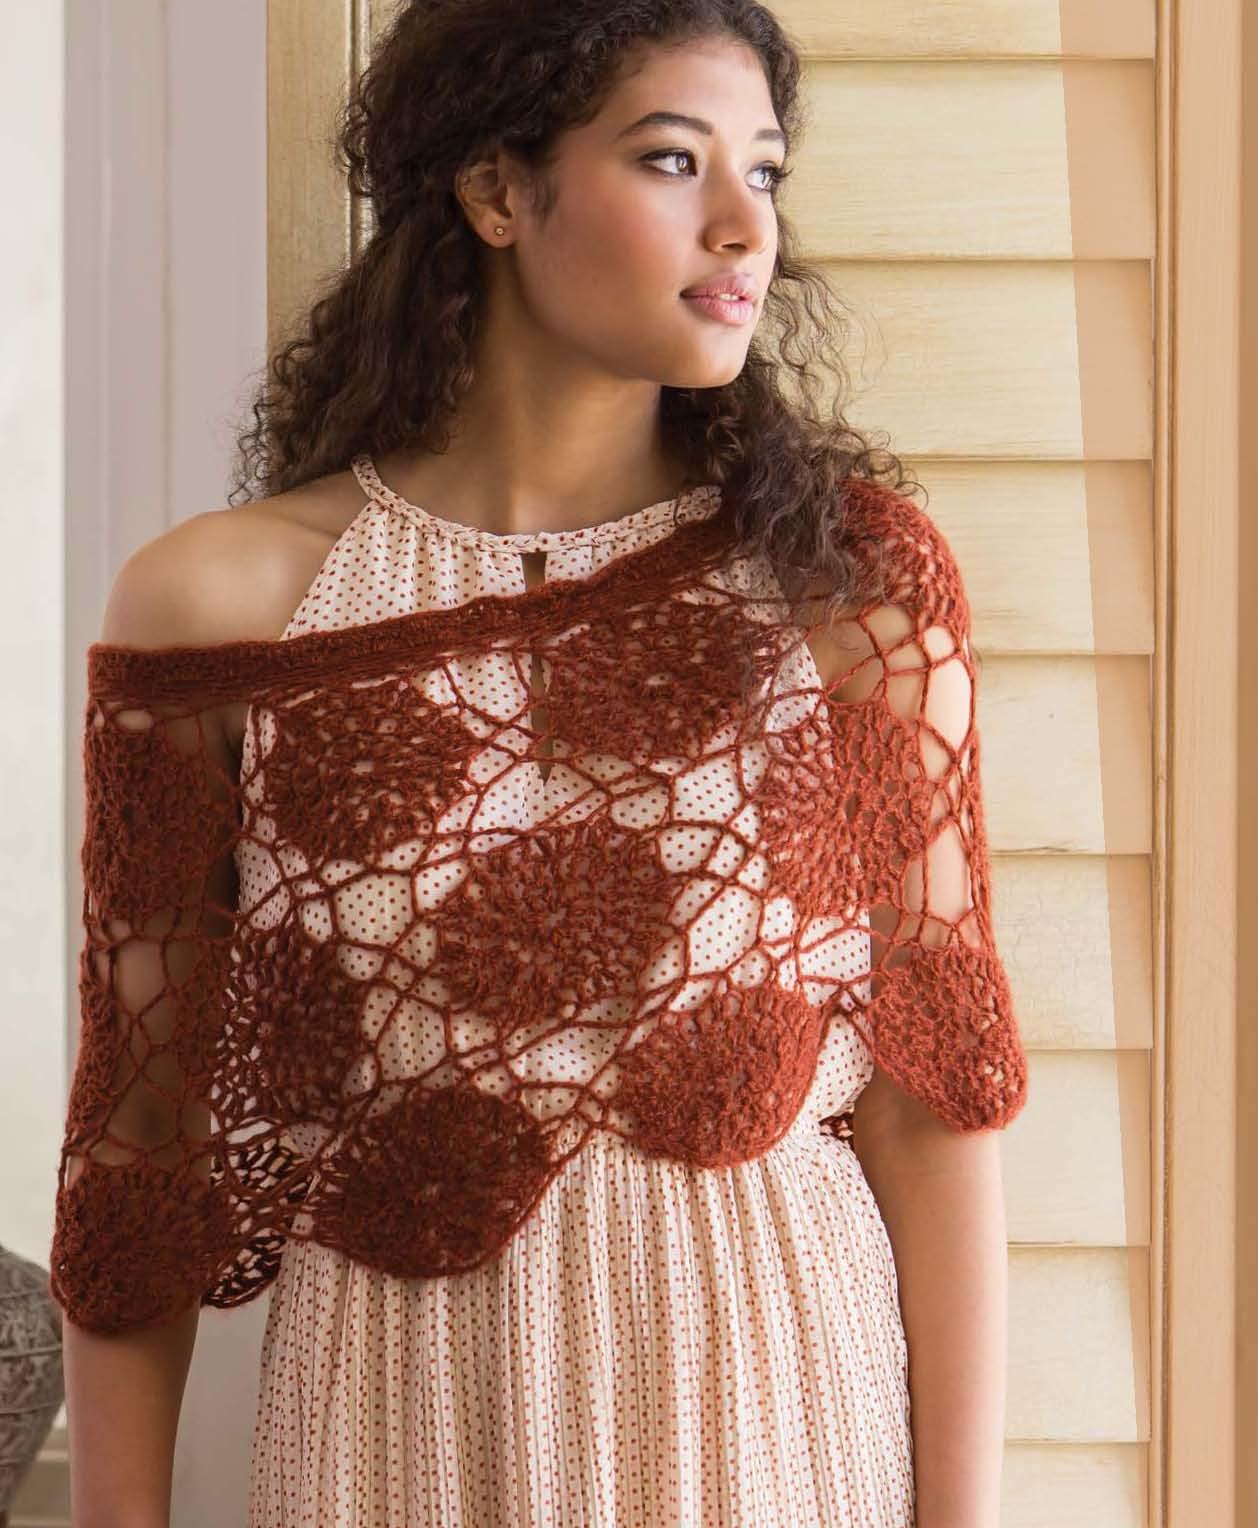 Crochet So Lovely -  Rustica Capelet beauty shot.jpg